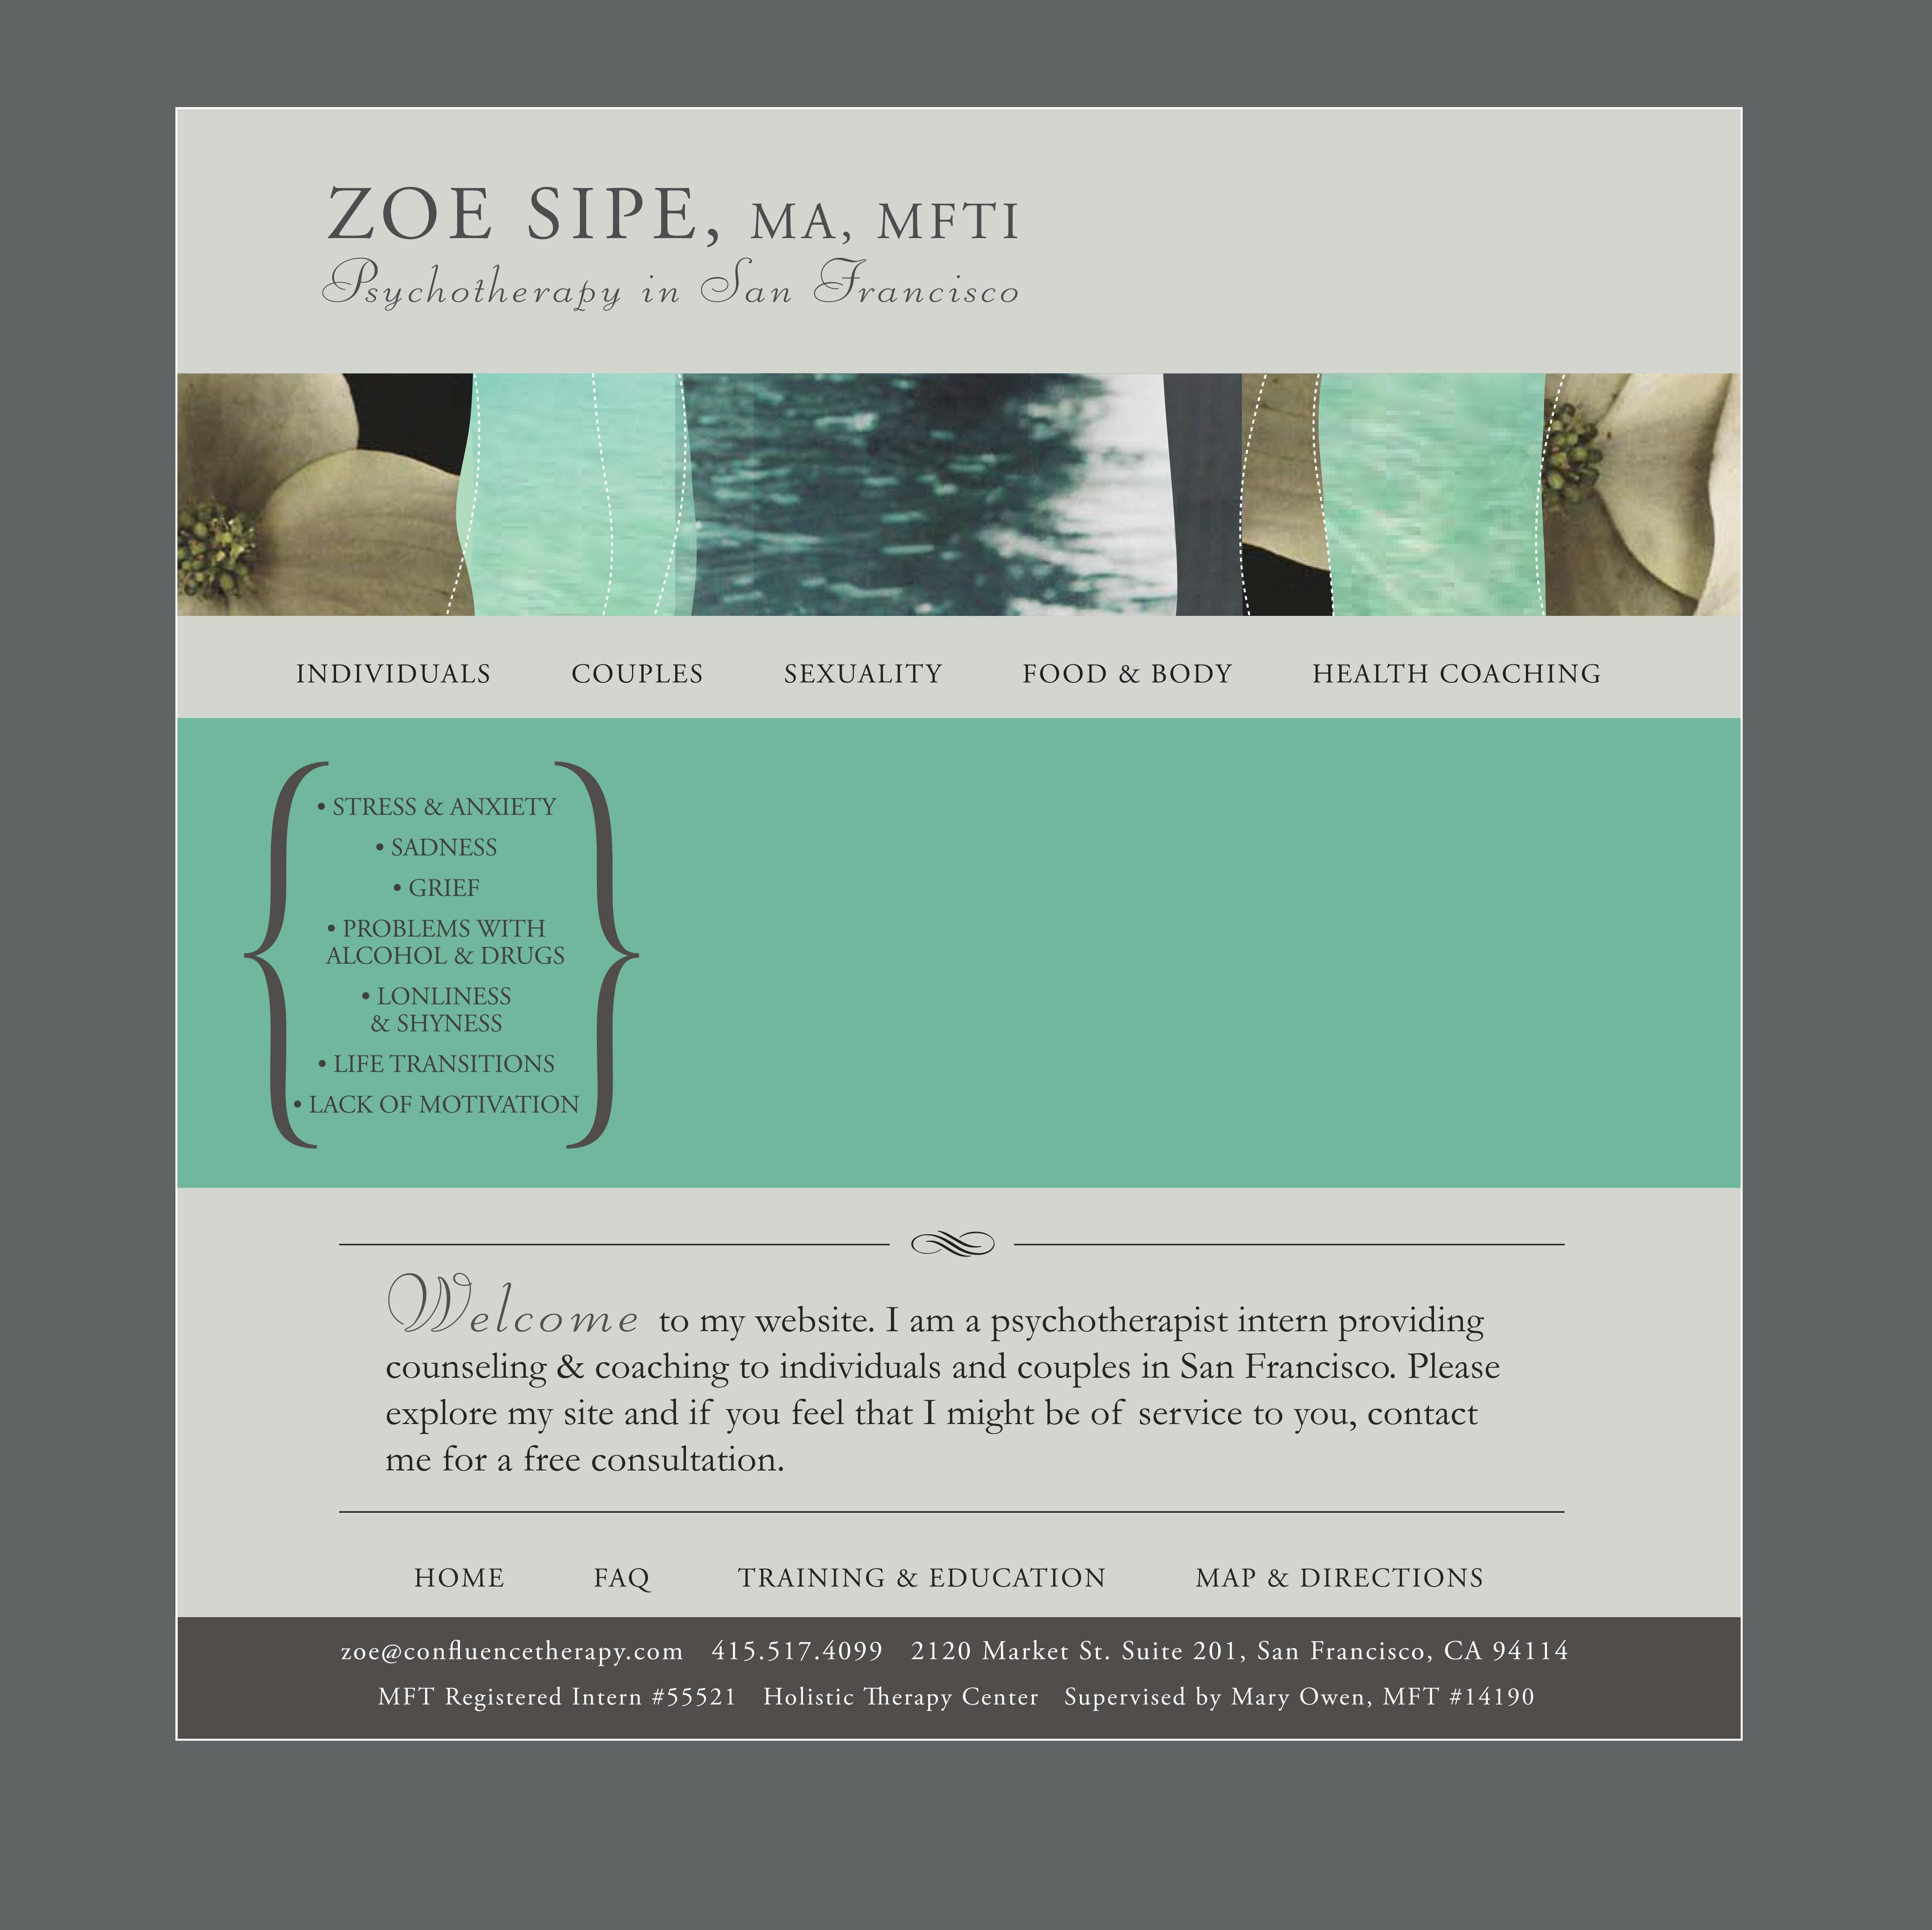 Zoe Sipe, MFT